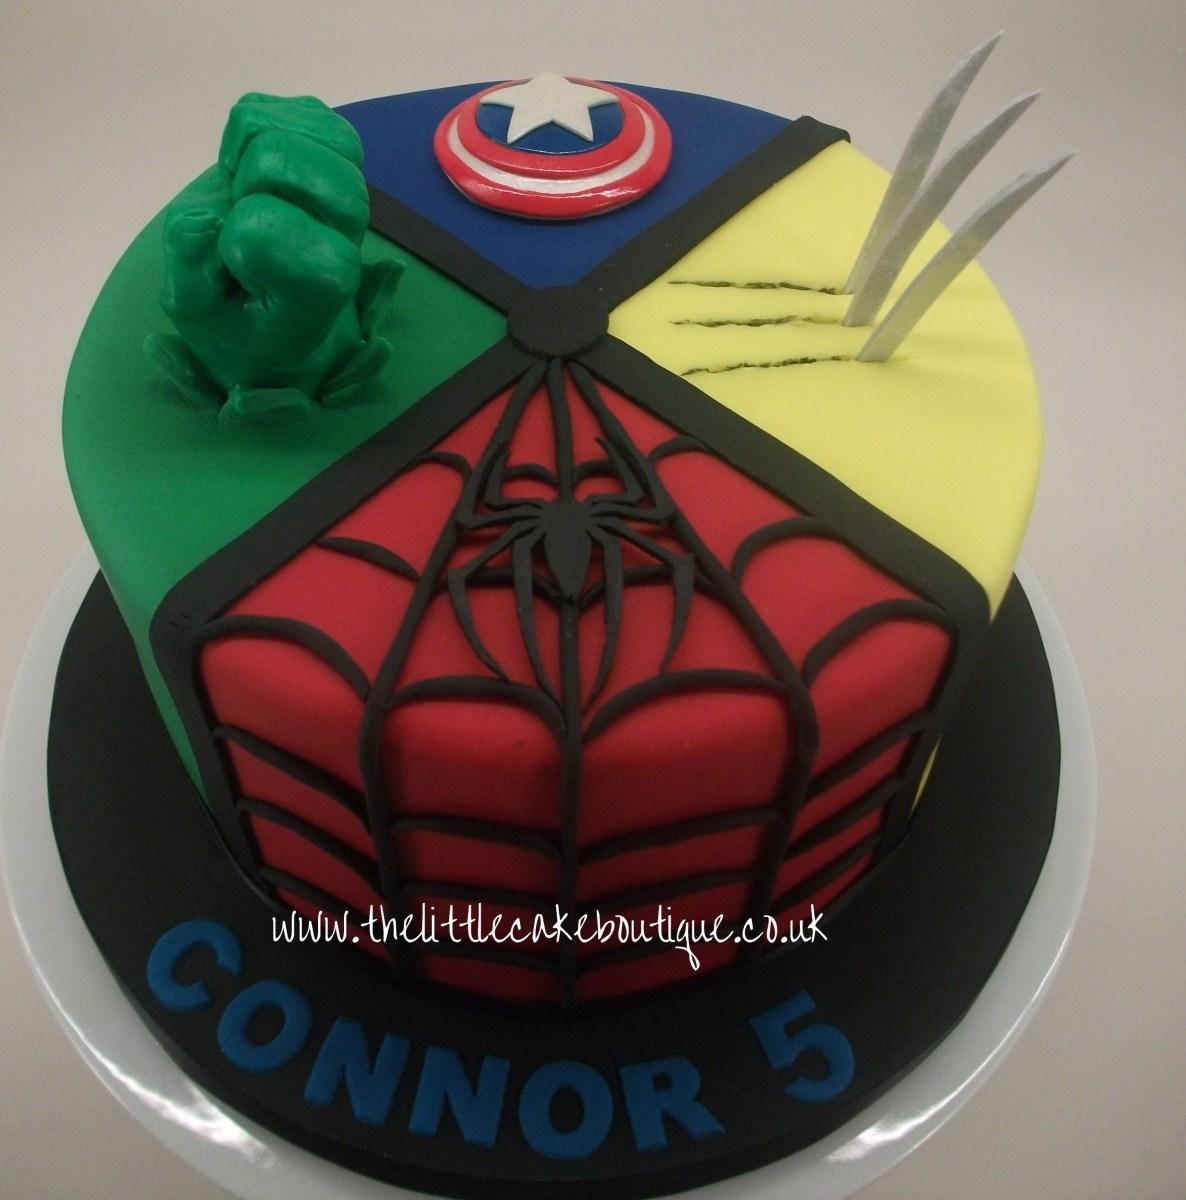 Peachy Marvel Birthday Cakes Marvel Avengers Birthday Cake With Hulk Fist Personalised Birthday Cards Veneteletsinfo